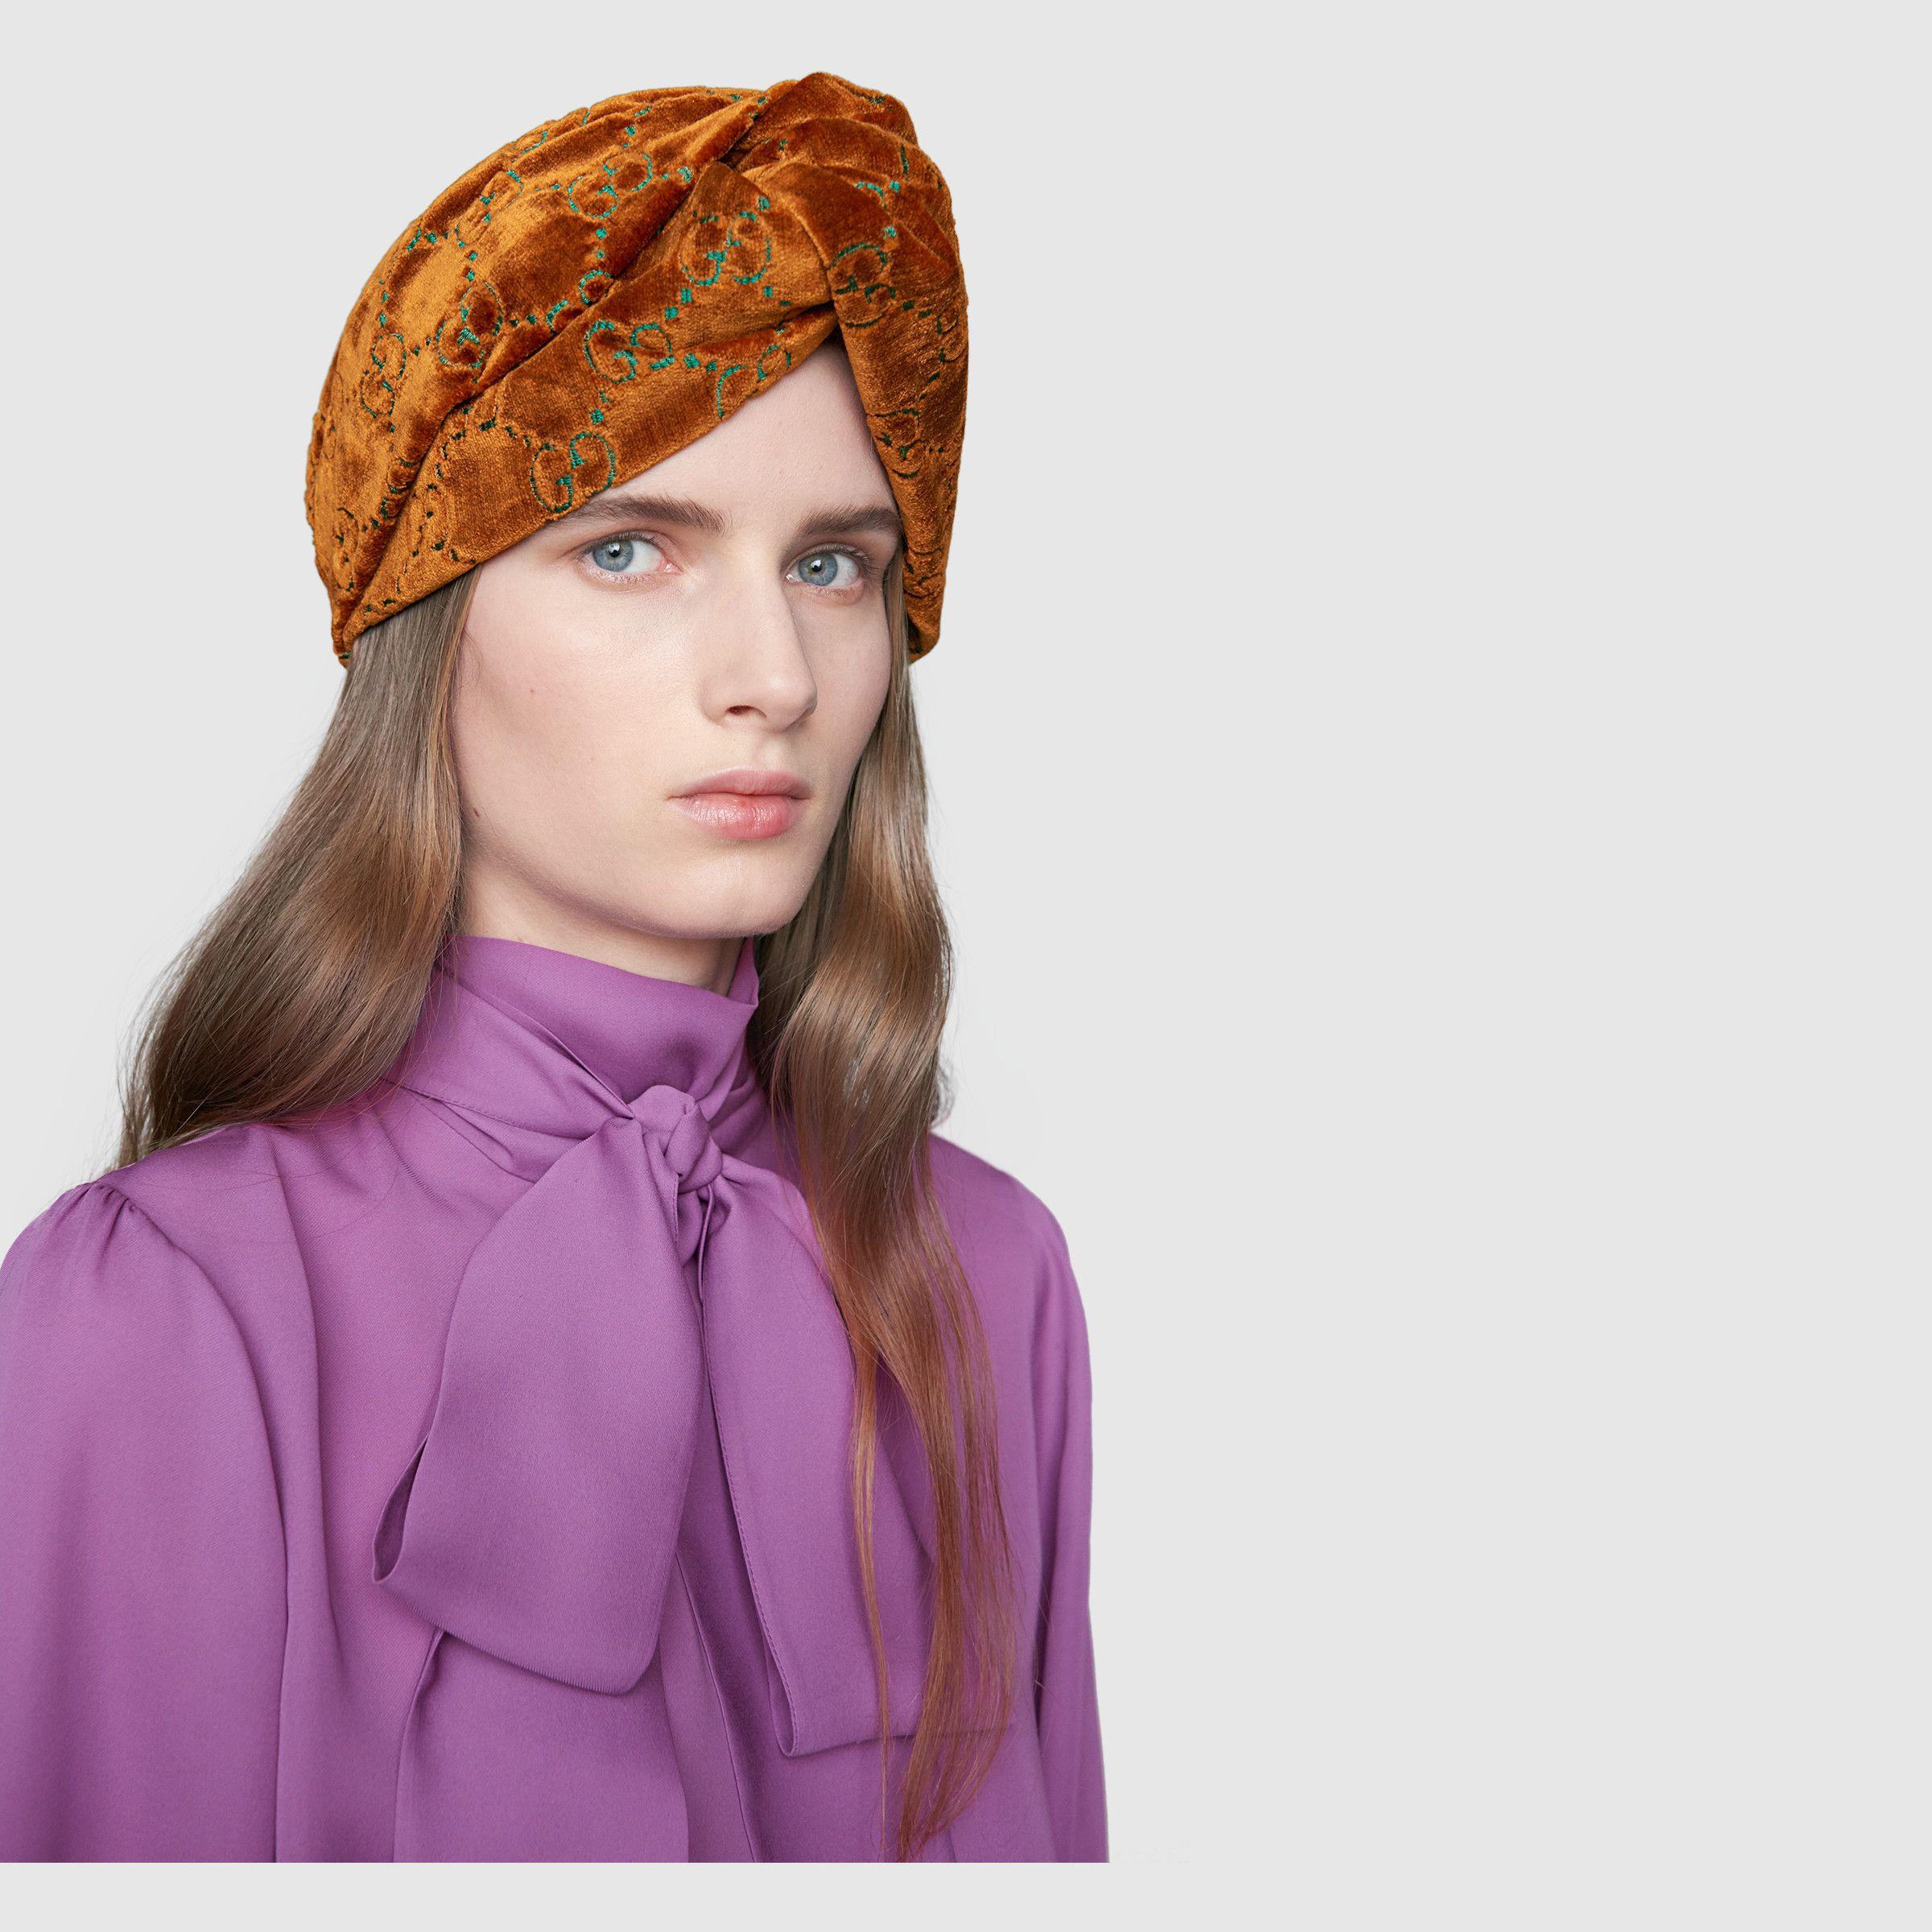 13edf30ad4 GG velvet headband - Gucci Women's Headbands 5237873GA647700 ...